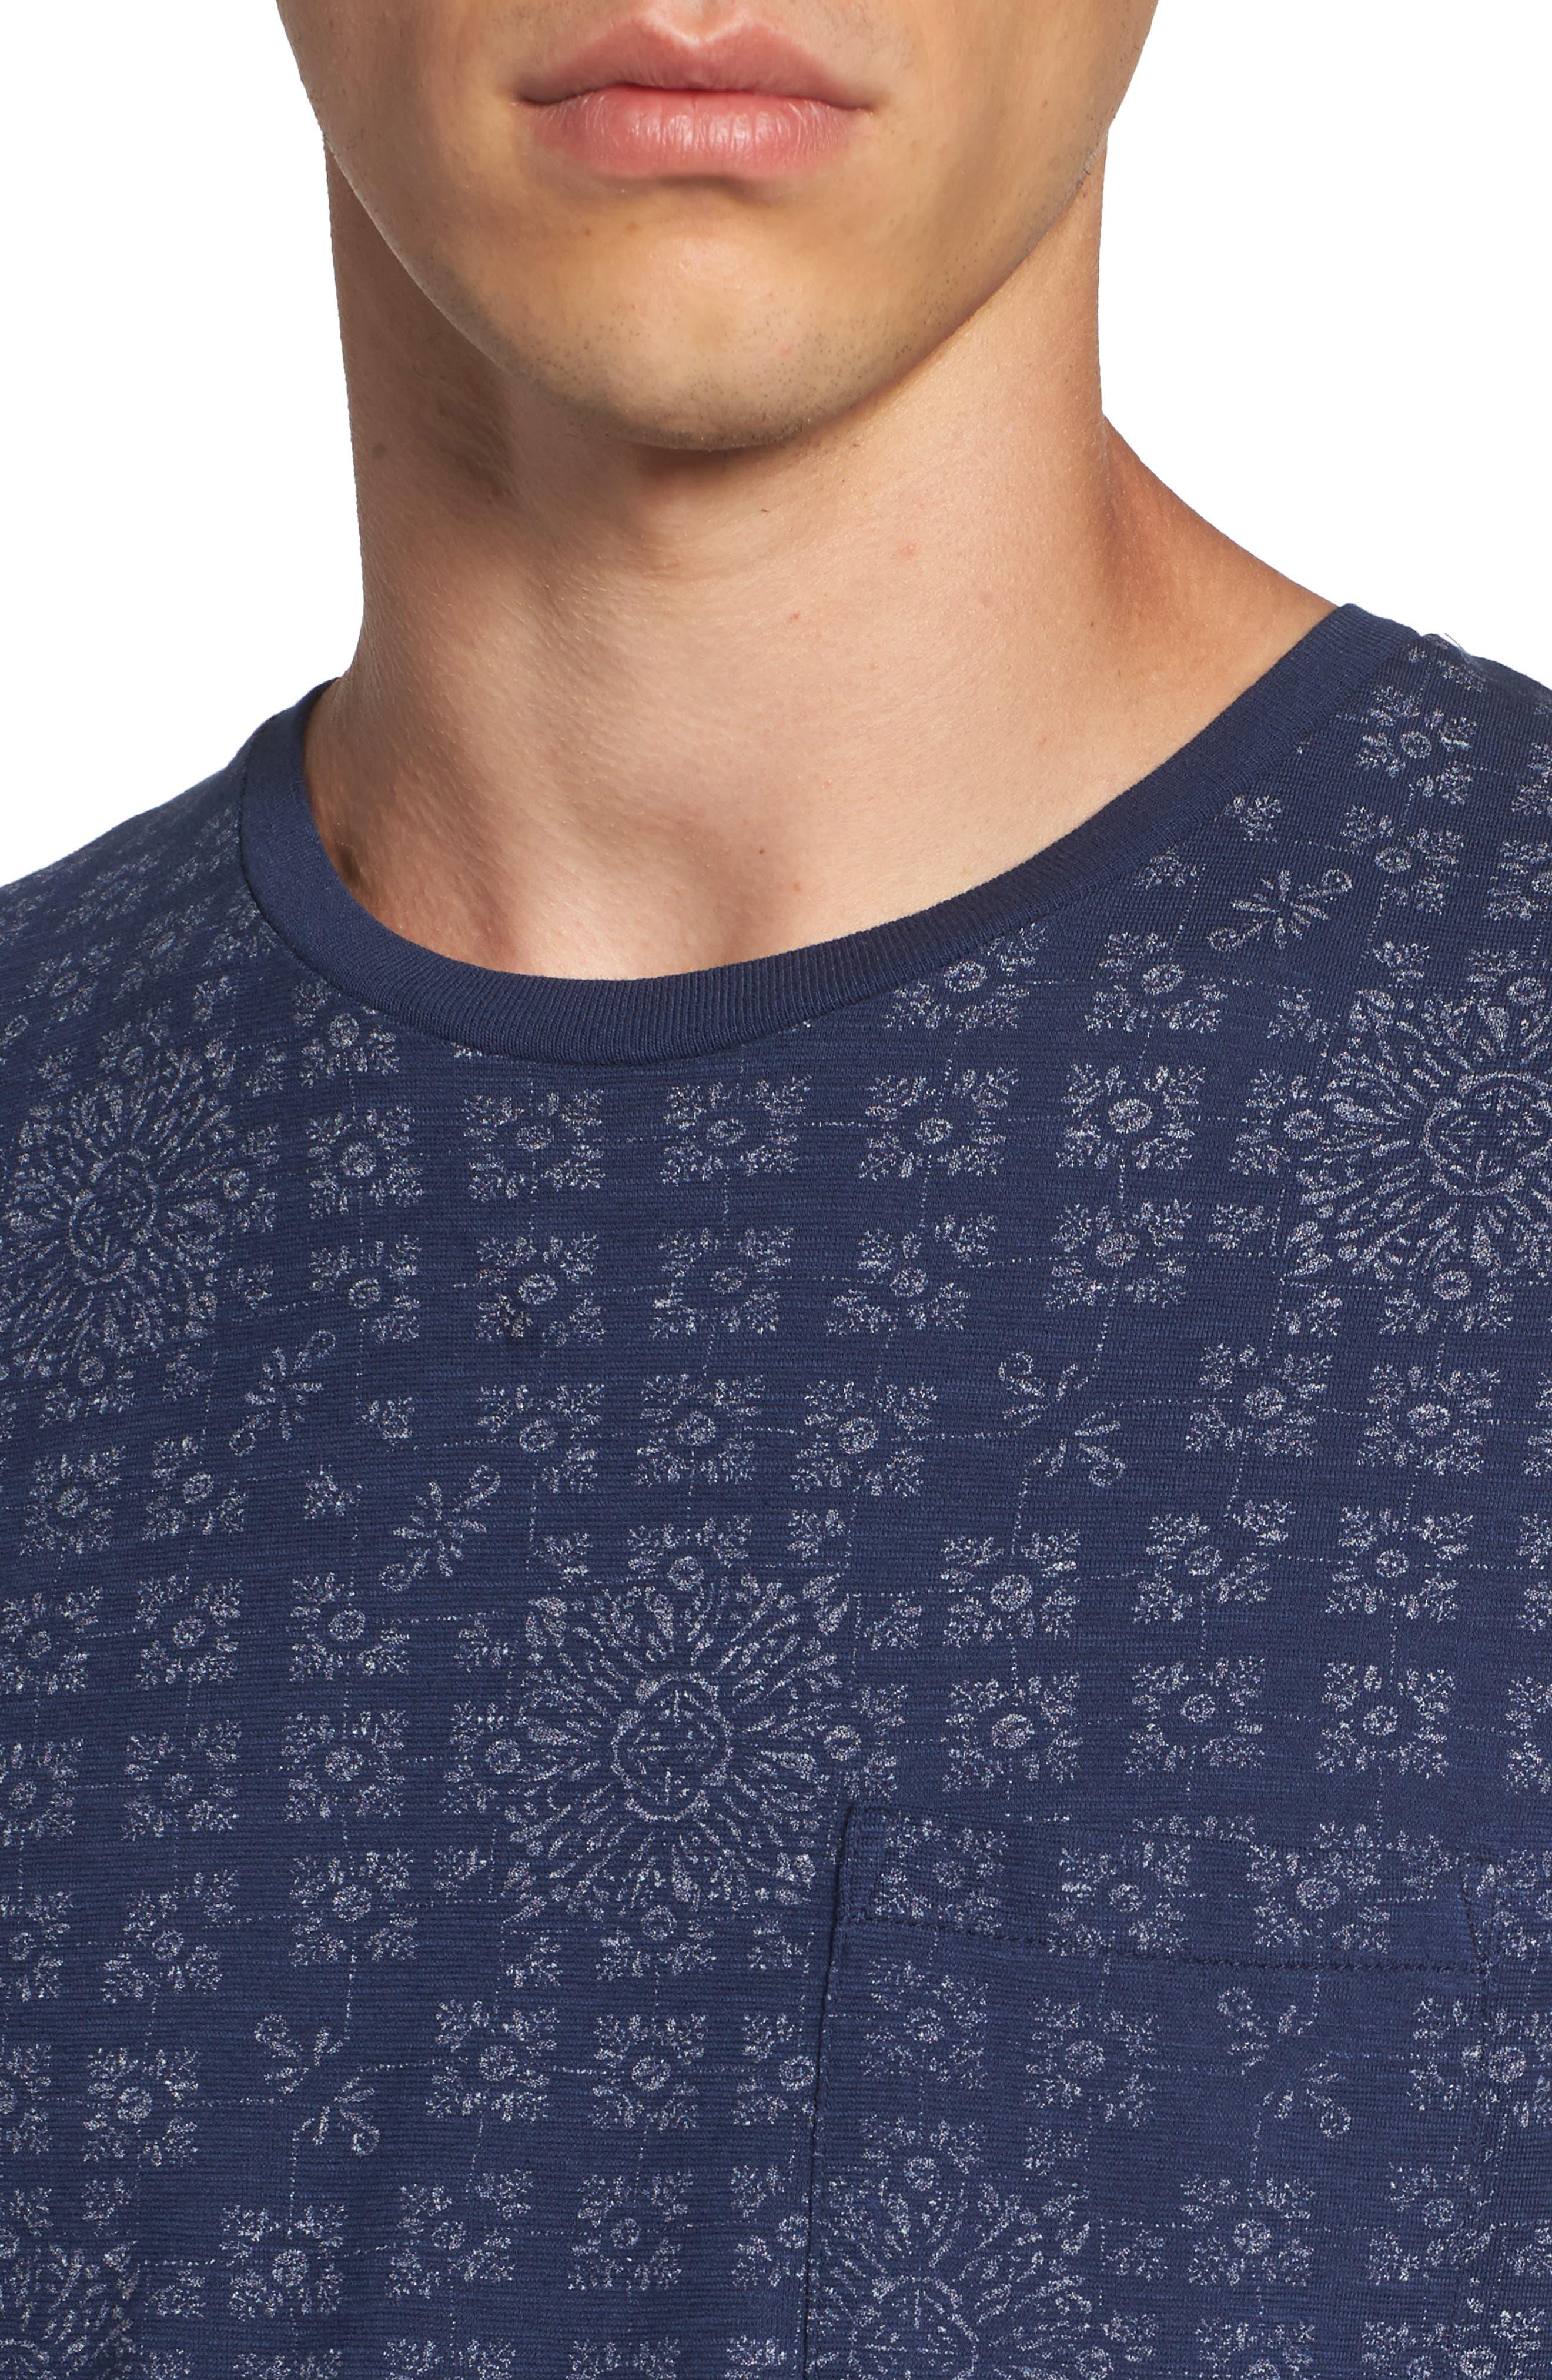 AMS Graphic T-Shirt,                             Alternate thumbnail 4, color,                             Combo D